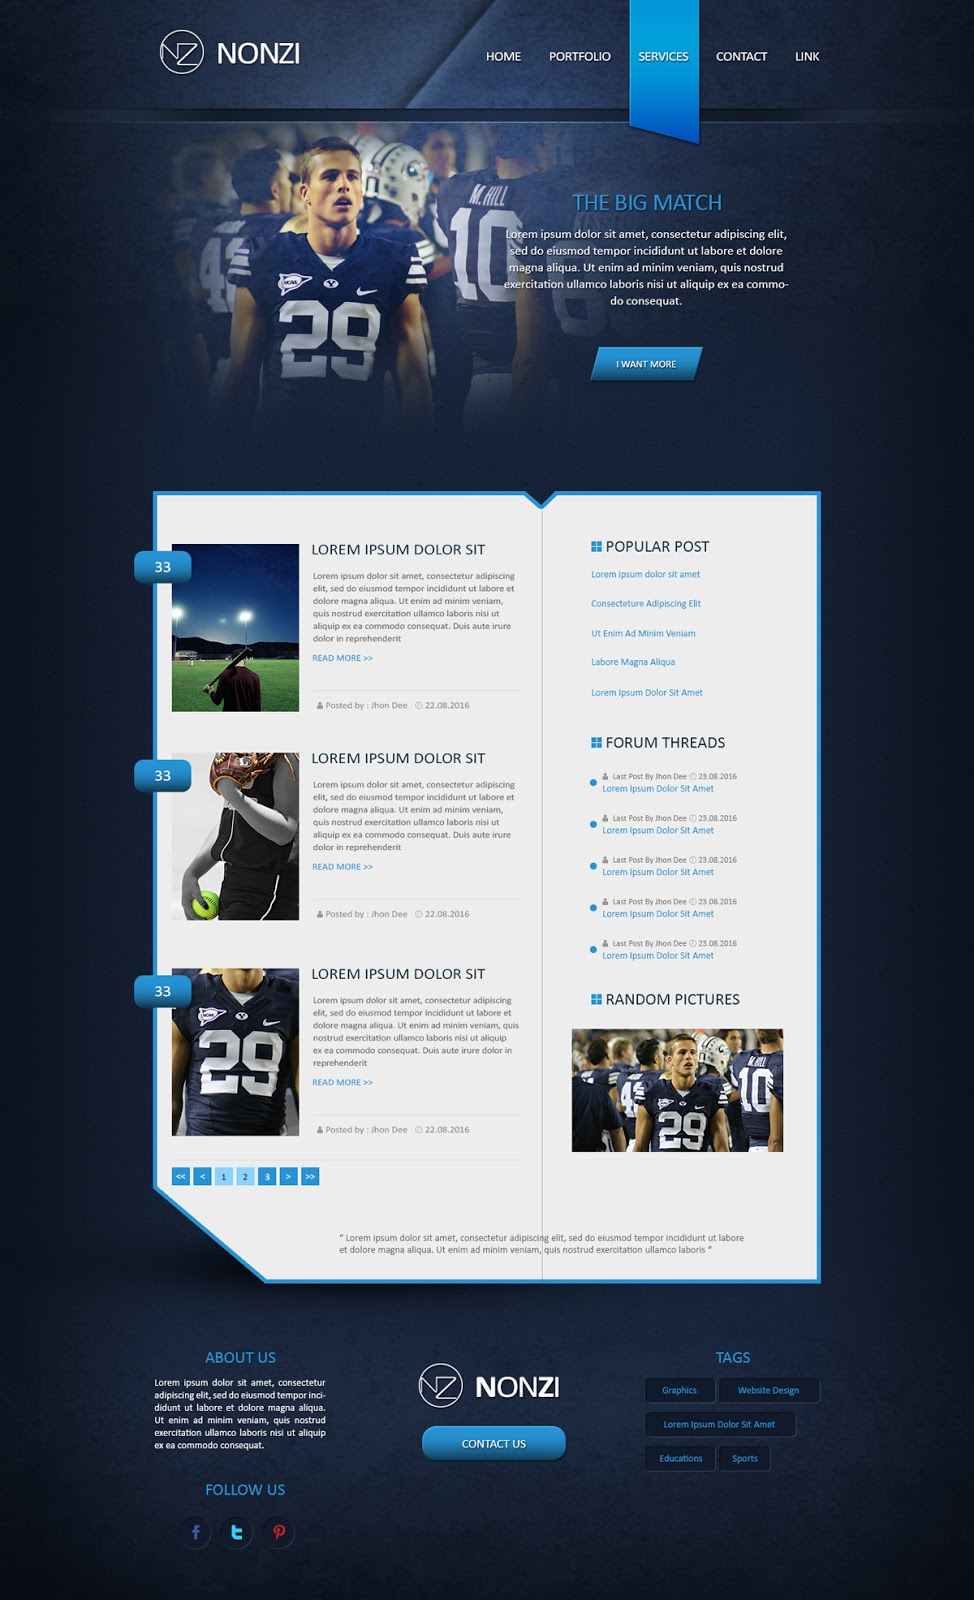 Designing an Creative Blog Design In Photoshop